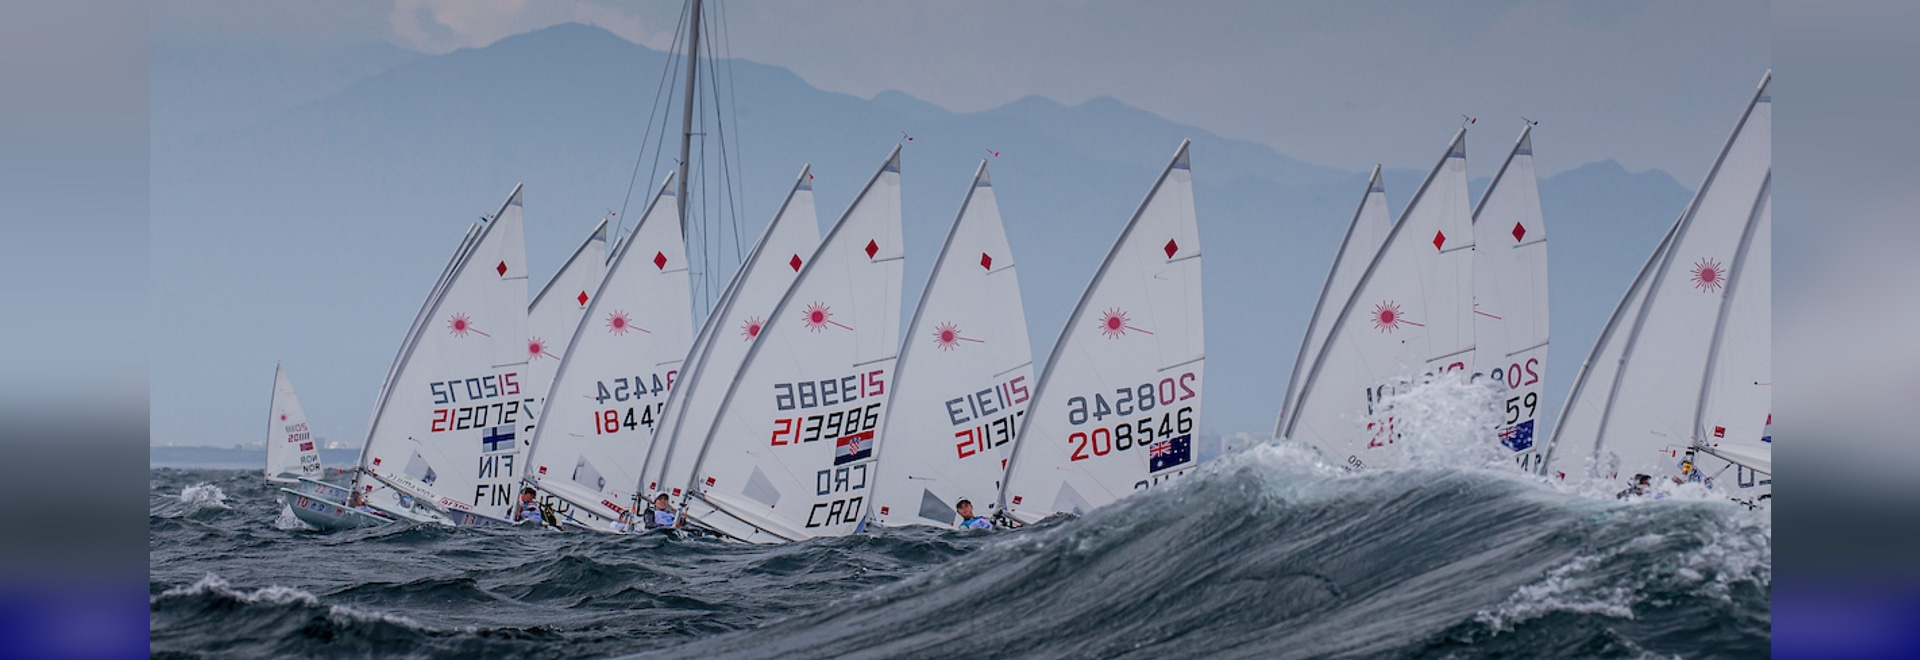 Olympic sailing: World Sailing confirms Laser singlehander for Paris 2024